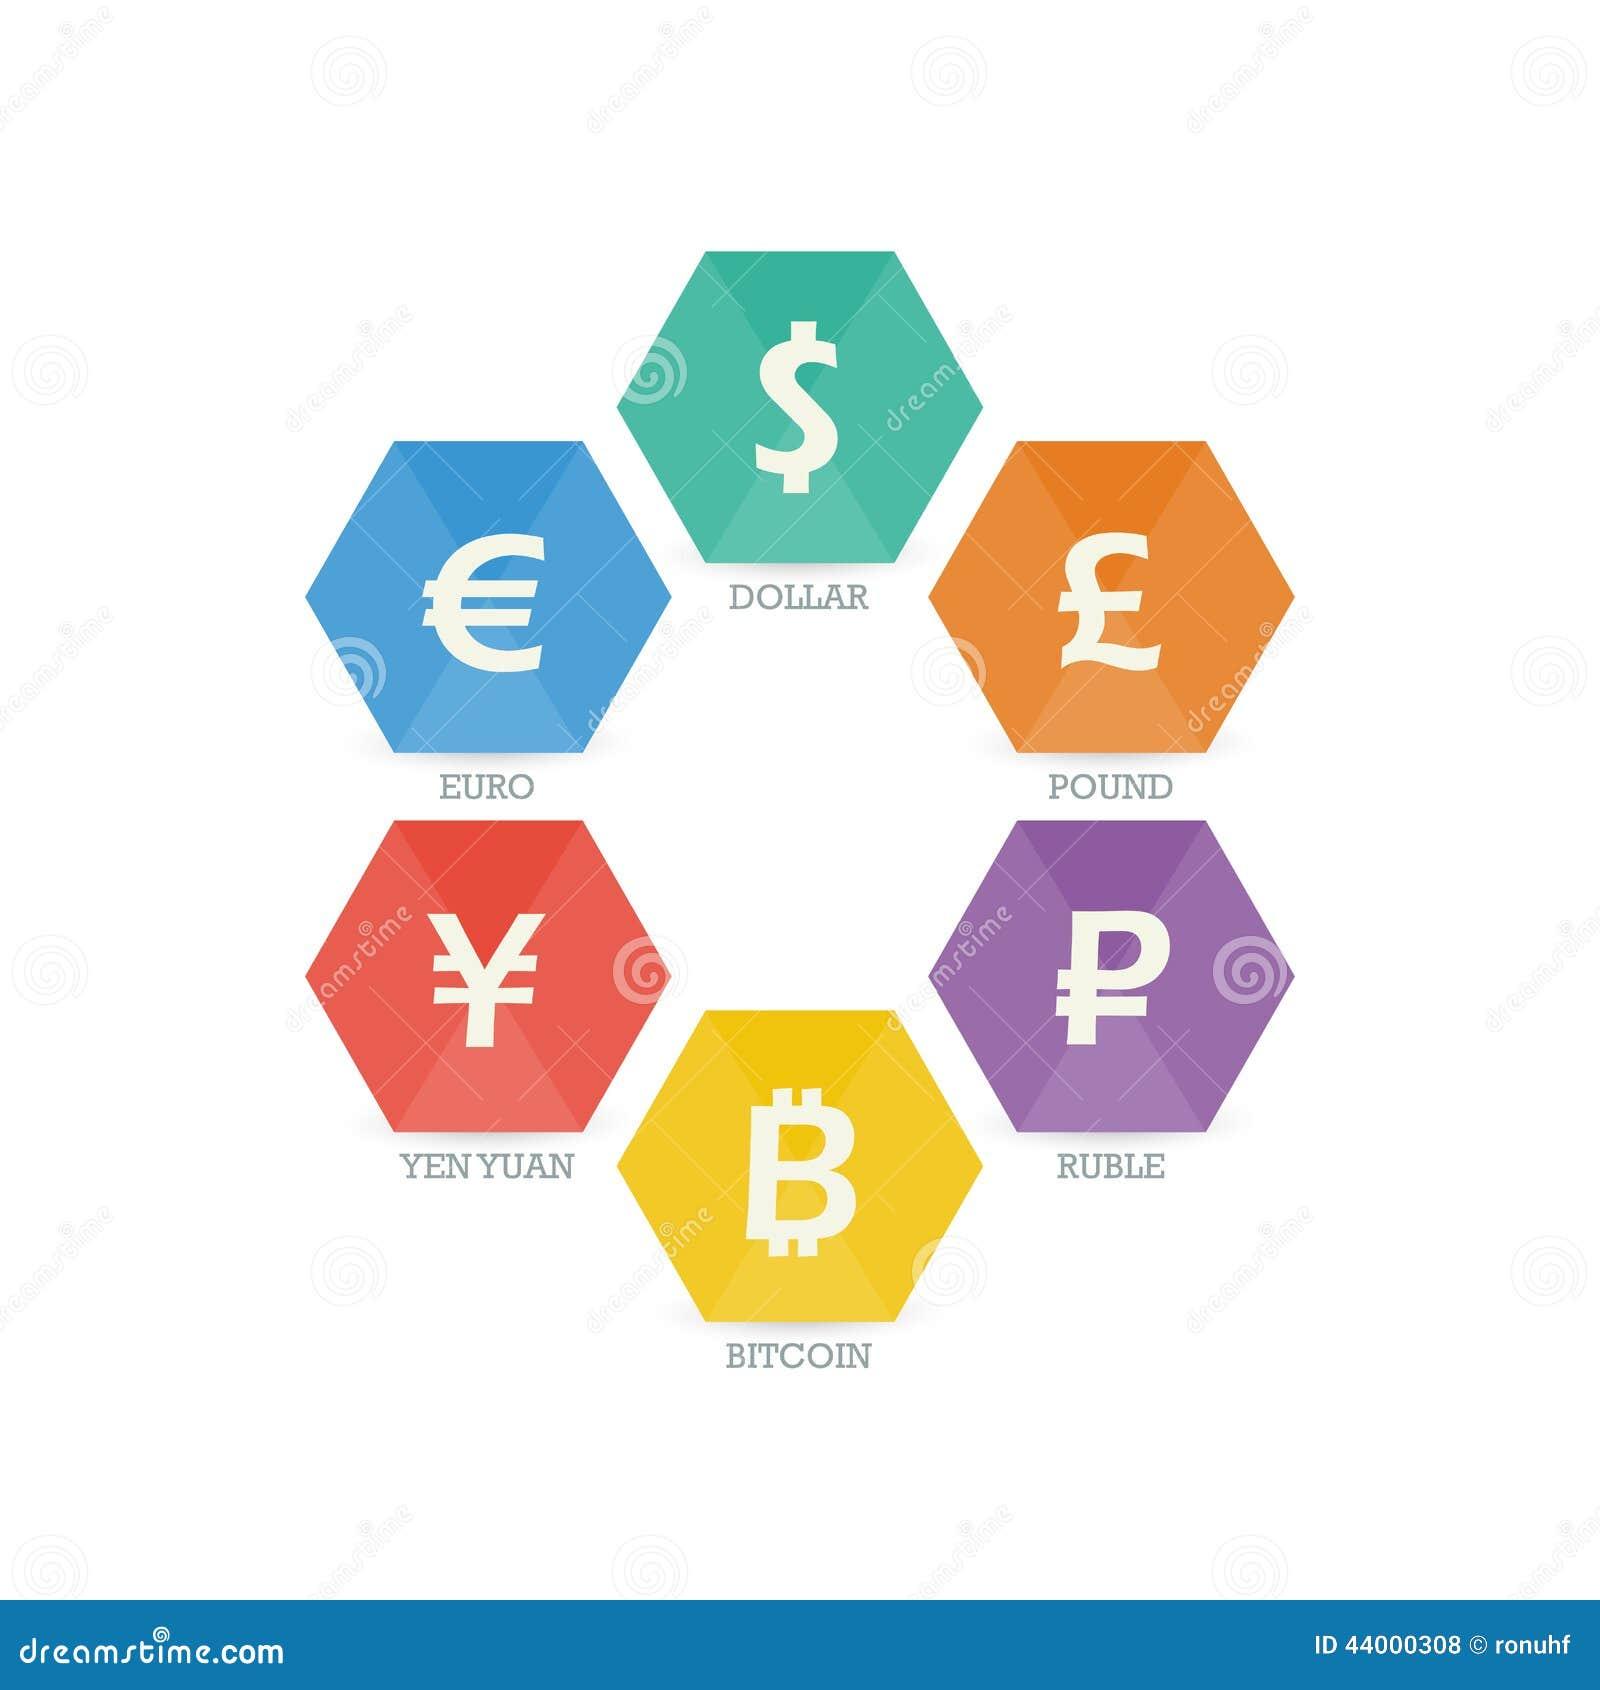 Euro dollar yen yuan bitcoin ruble pound mainstream currencies euro dollar yen yuan bitcoin ruble pound mainstream currencies symbols on shield sign biocorpaavc Image collections